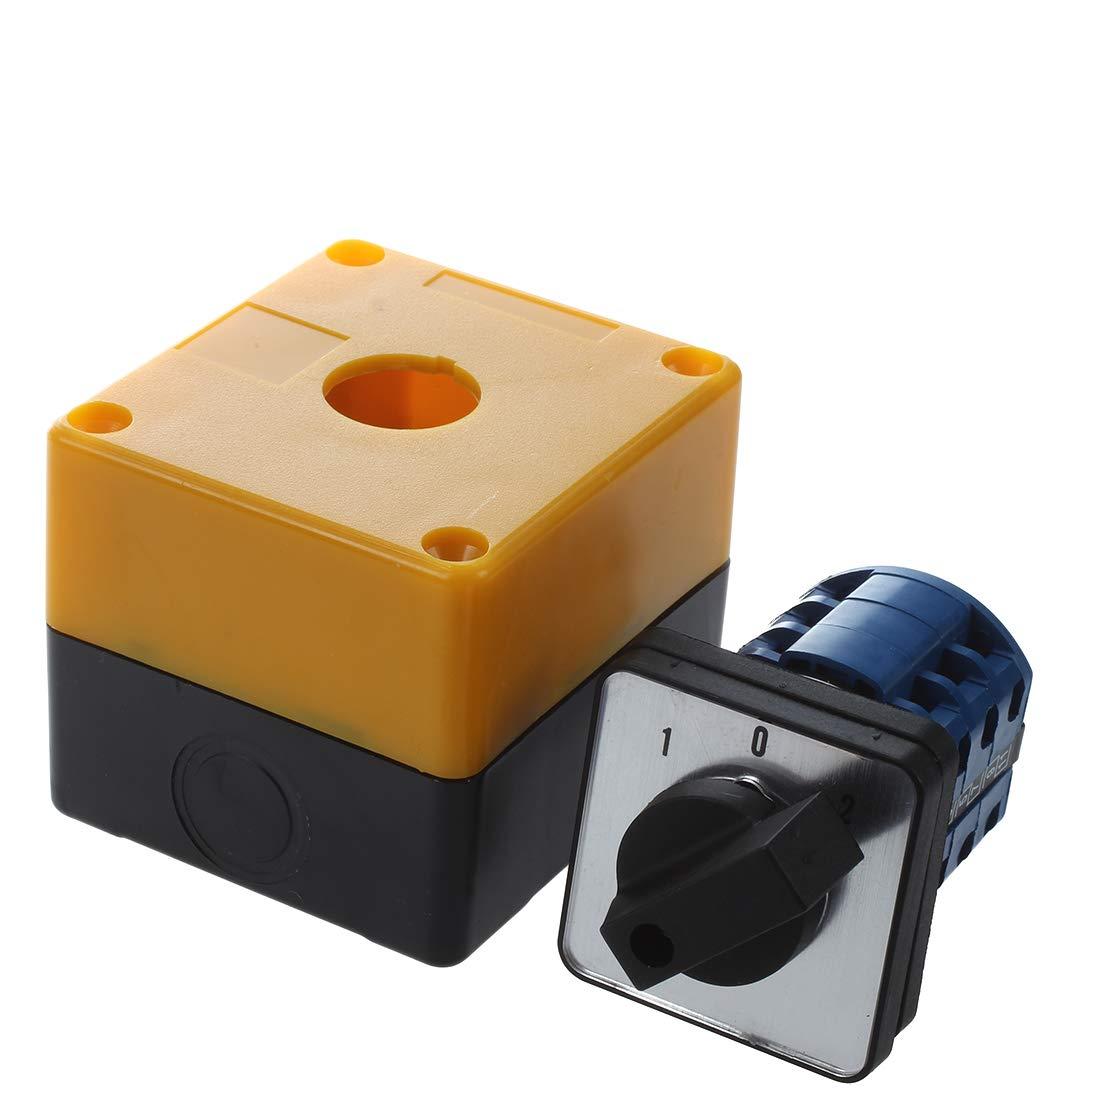 Interruptor - SODIAL(R)Interruptor conmutador 3 posiciones rotativo LW28-20/3 500V 20A Negro + Amarillo